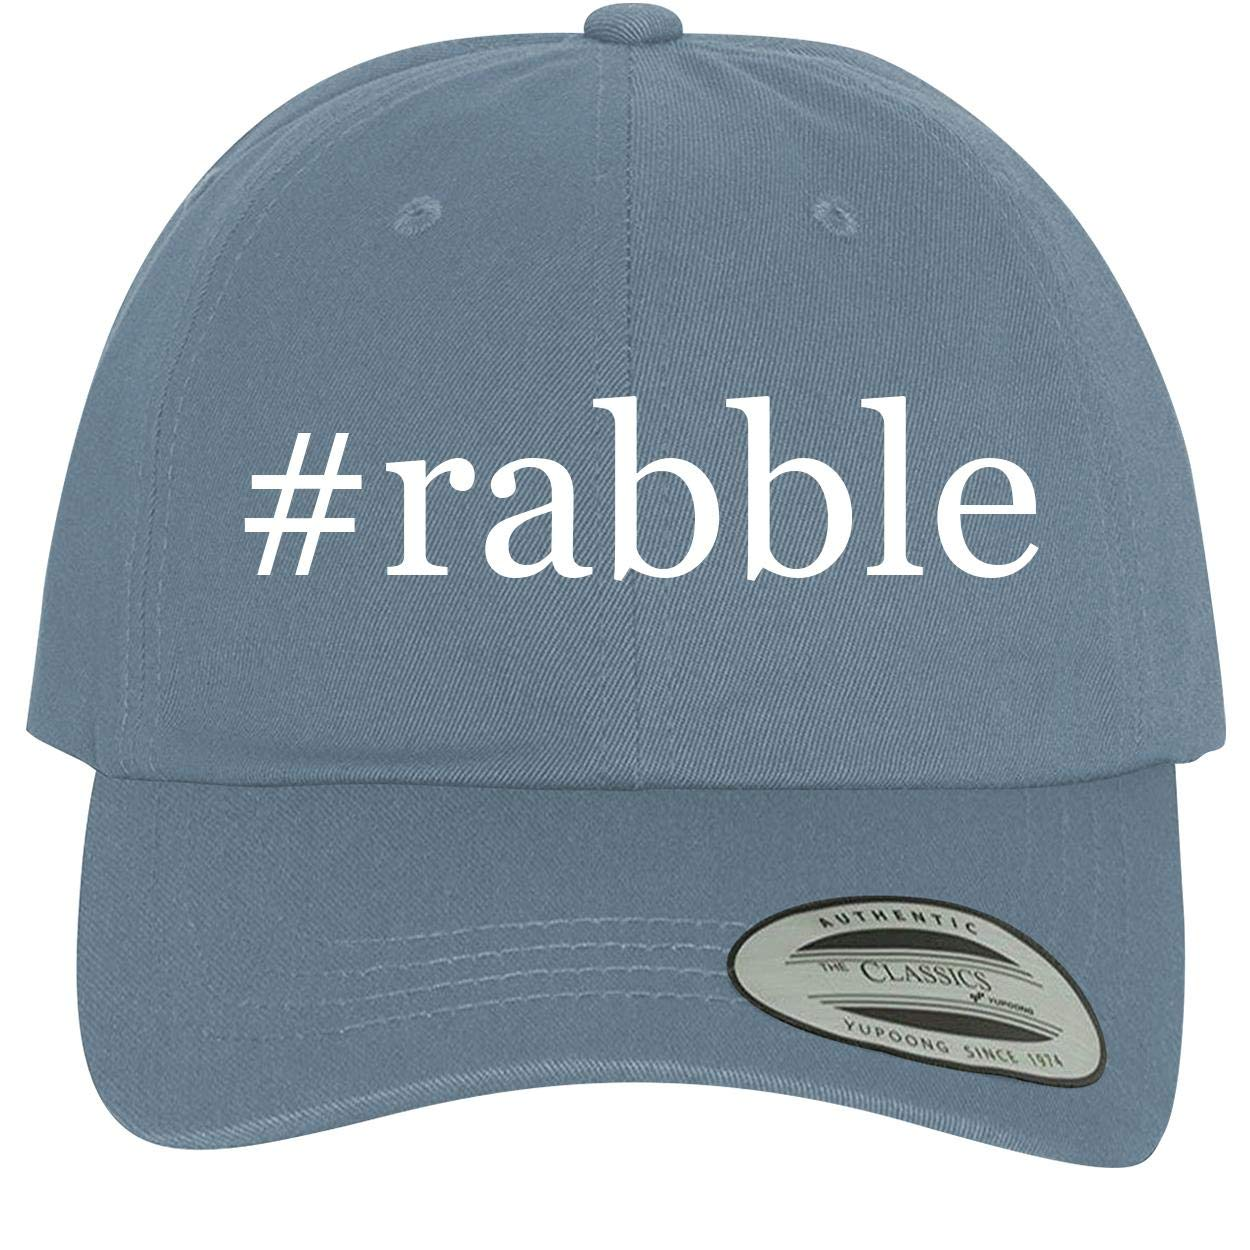 Comfortable Dad Hat Baseball Cap BH Cool Designs #Rabble